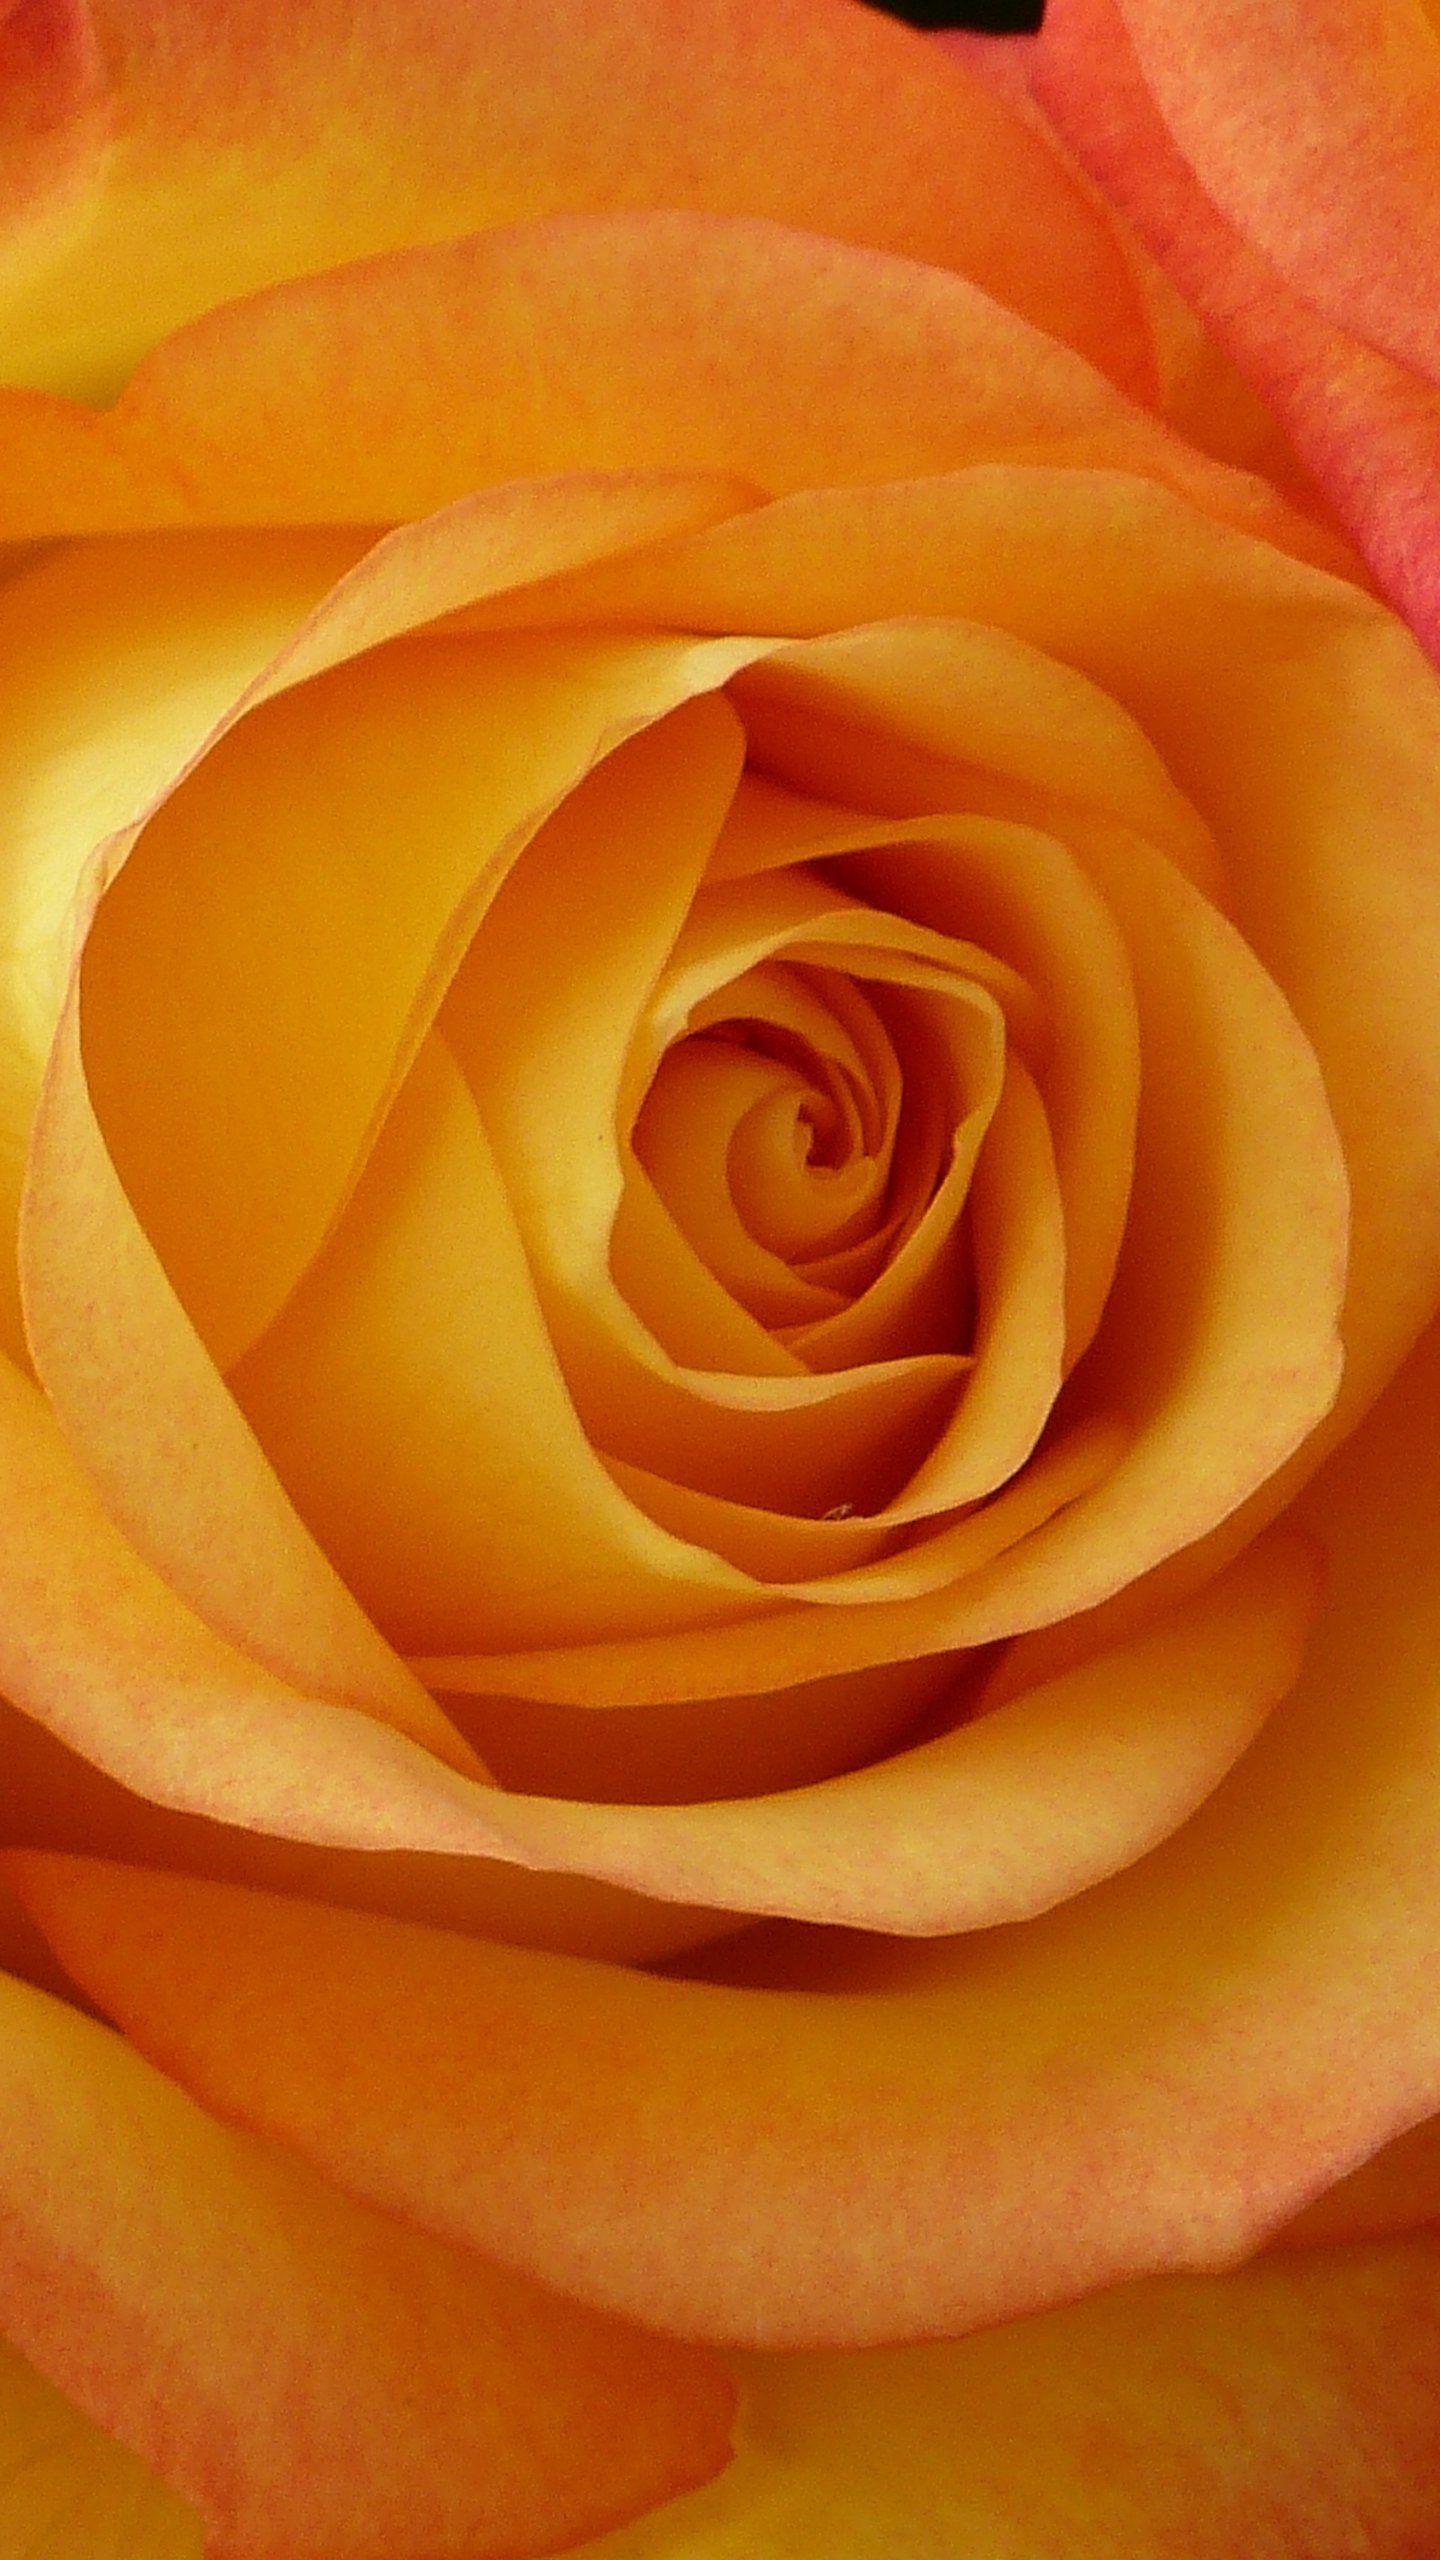 Peach Rose Wallpaper Iphone Android Desktop Backgrounds Peach Roses Rose Wallpaper Flower Wallpaper